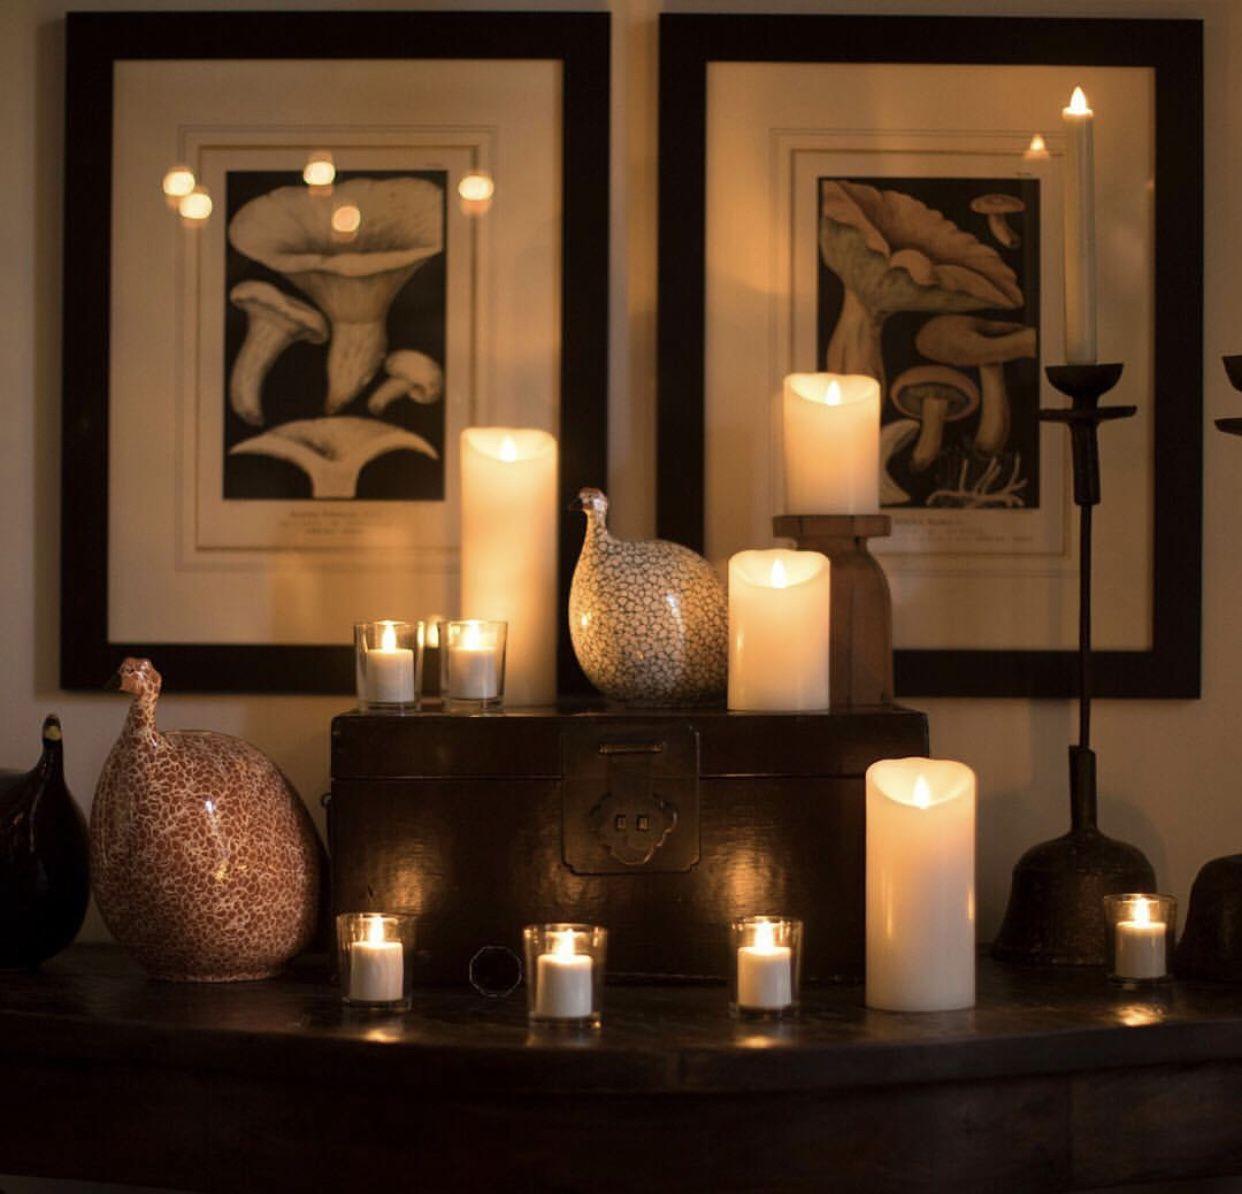 Wood Feature Wallideas: #luminara#decor#homedesign#candle#ambiance